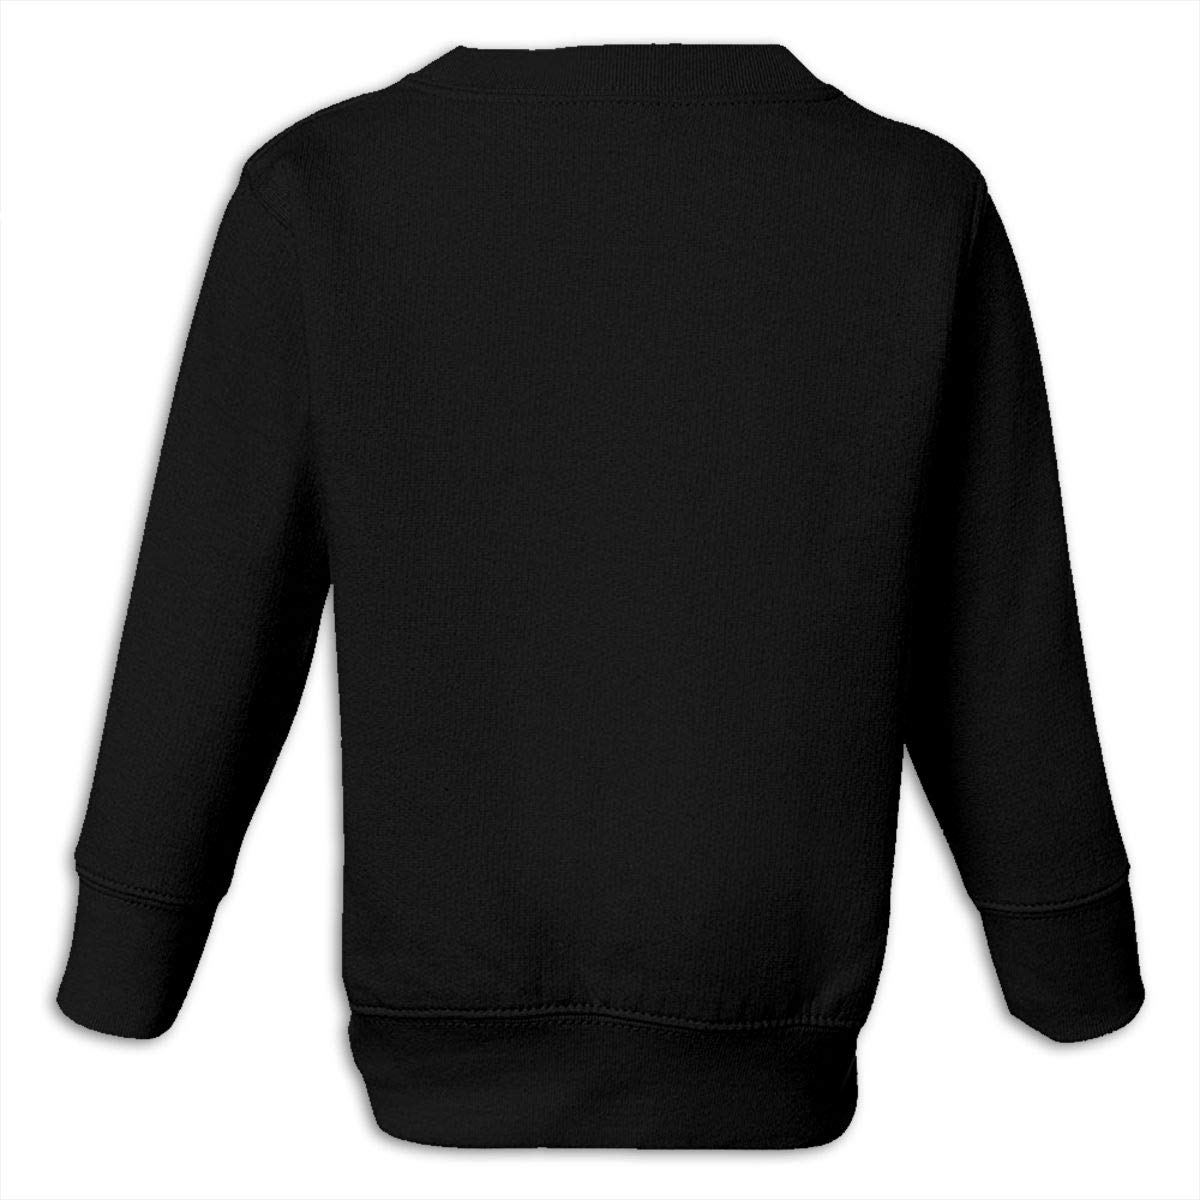 Dads Little Dude Baby Sweatshirt Stylish Kids Hoodies Comfortable Sweaters